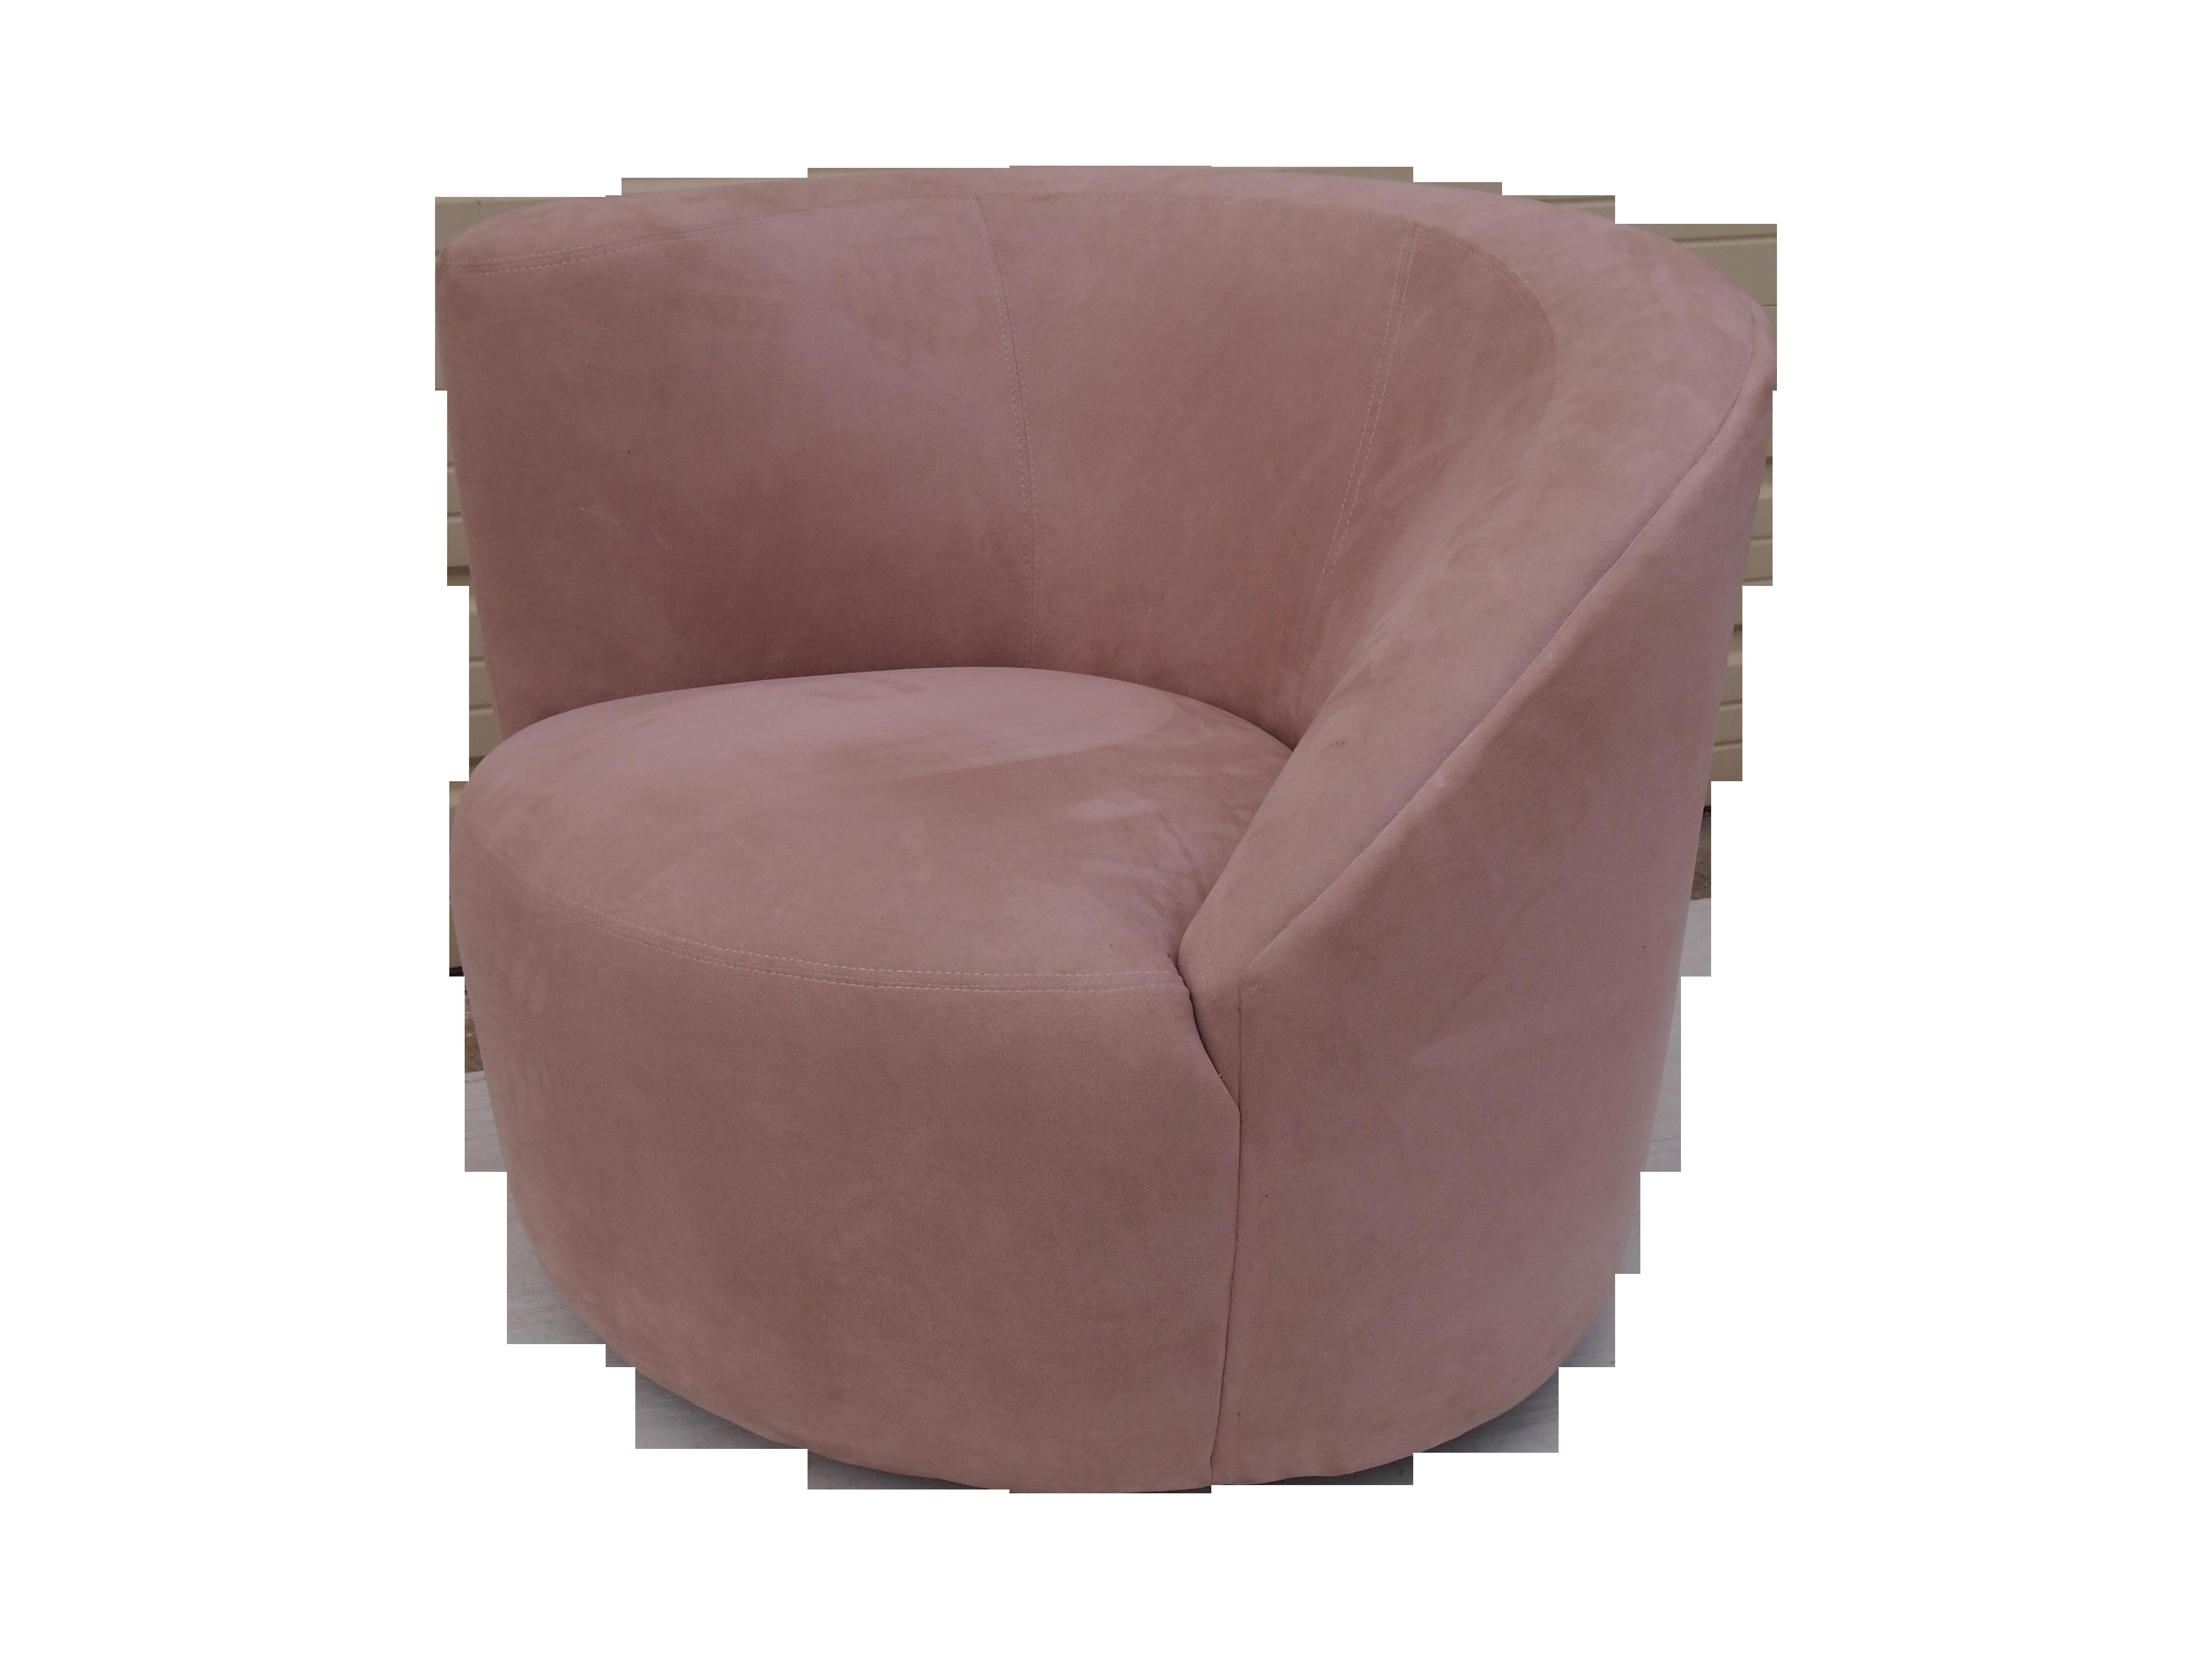 Vladimir Kagan Nautilus Swivel Arm Chair